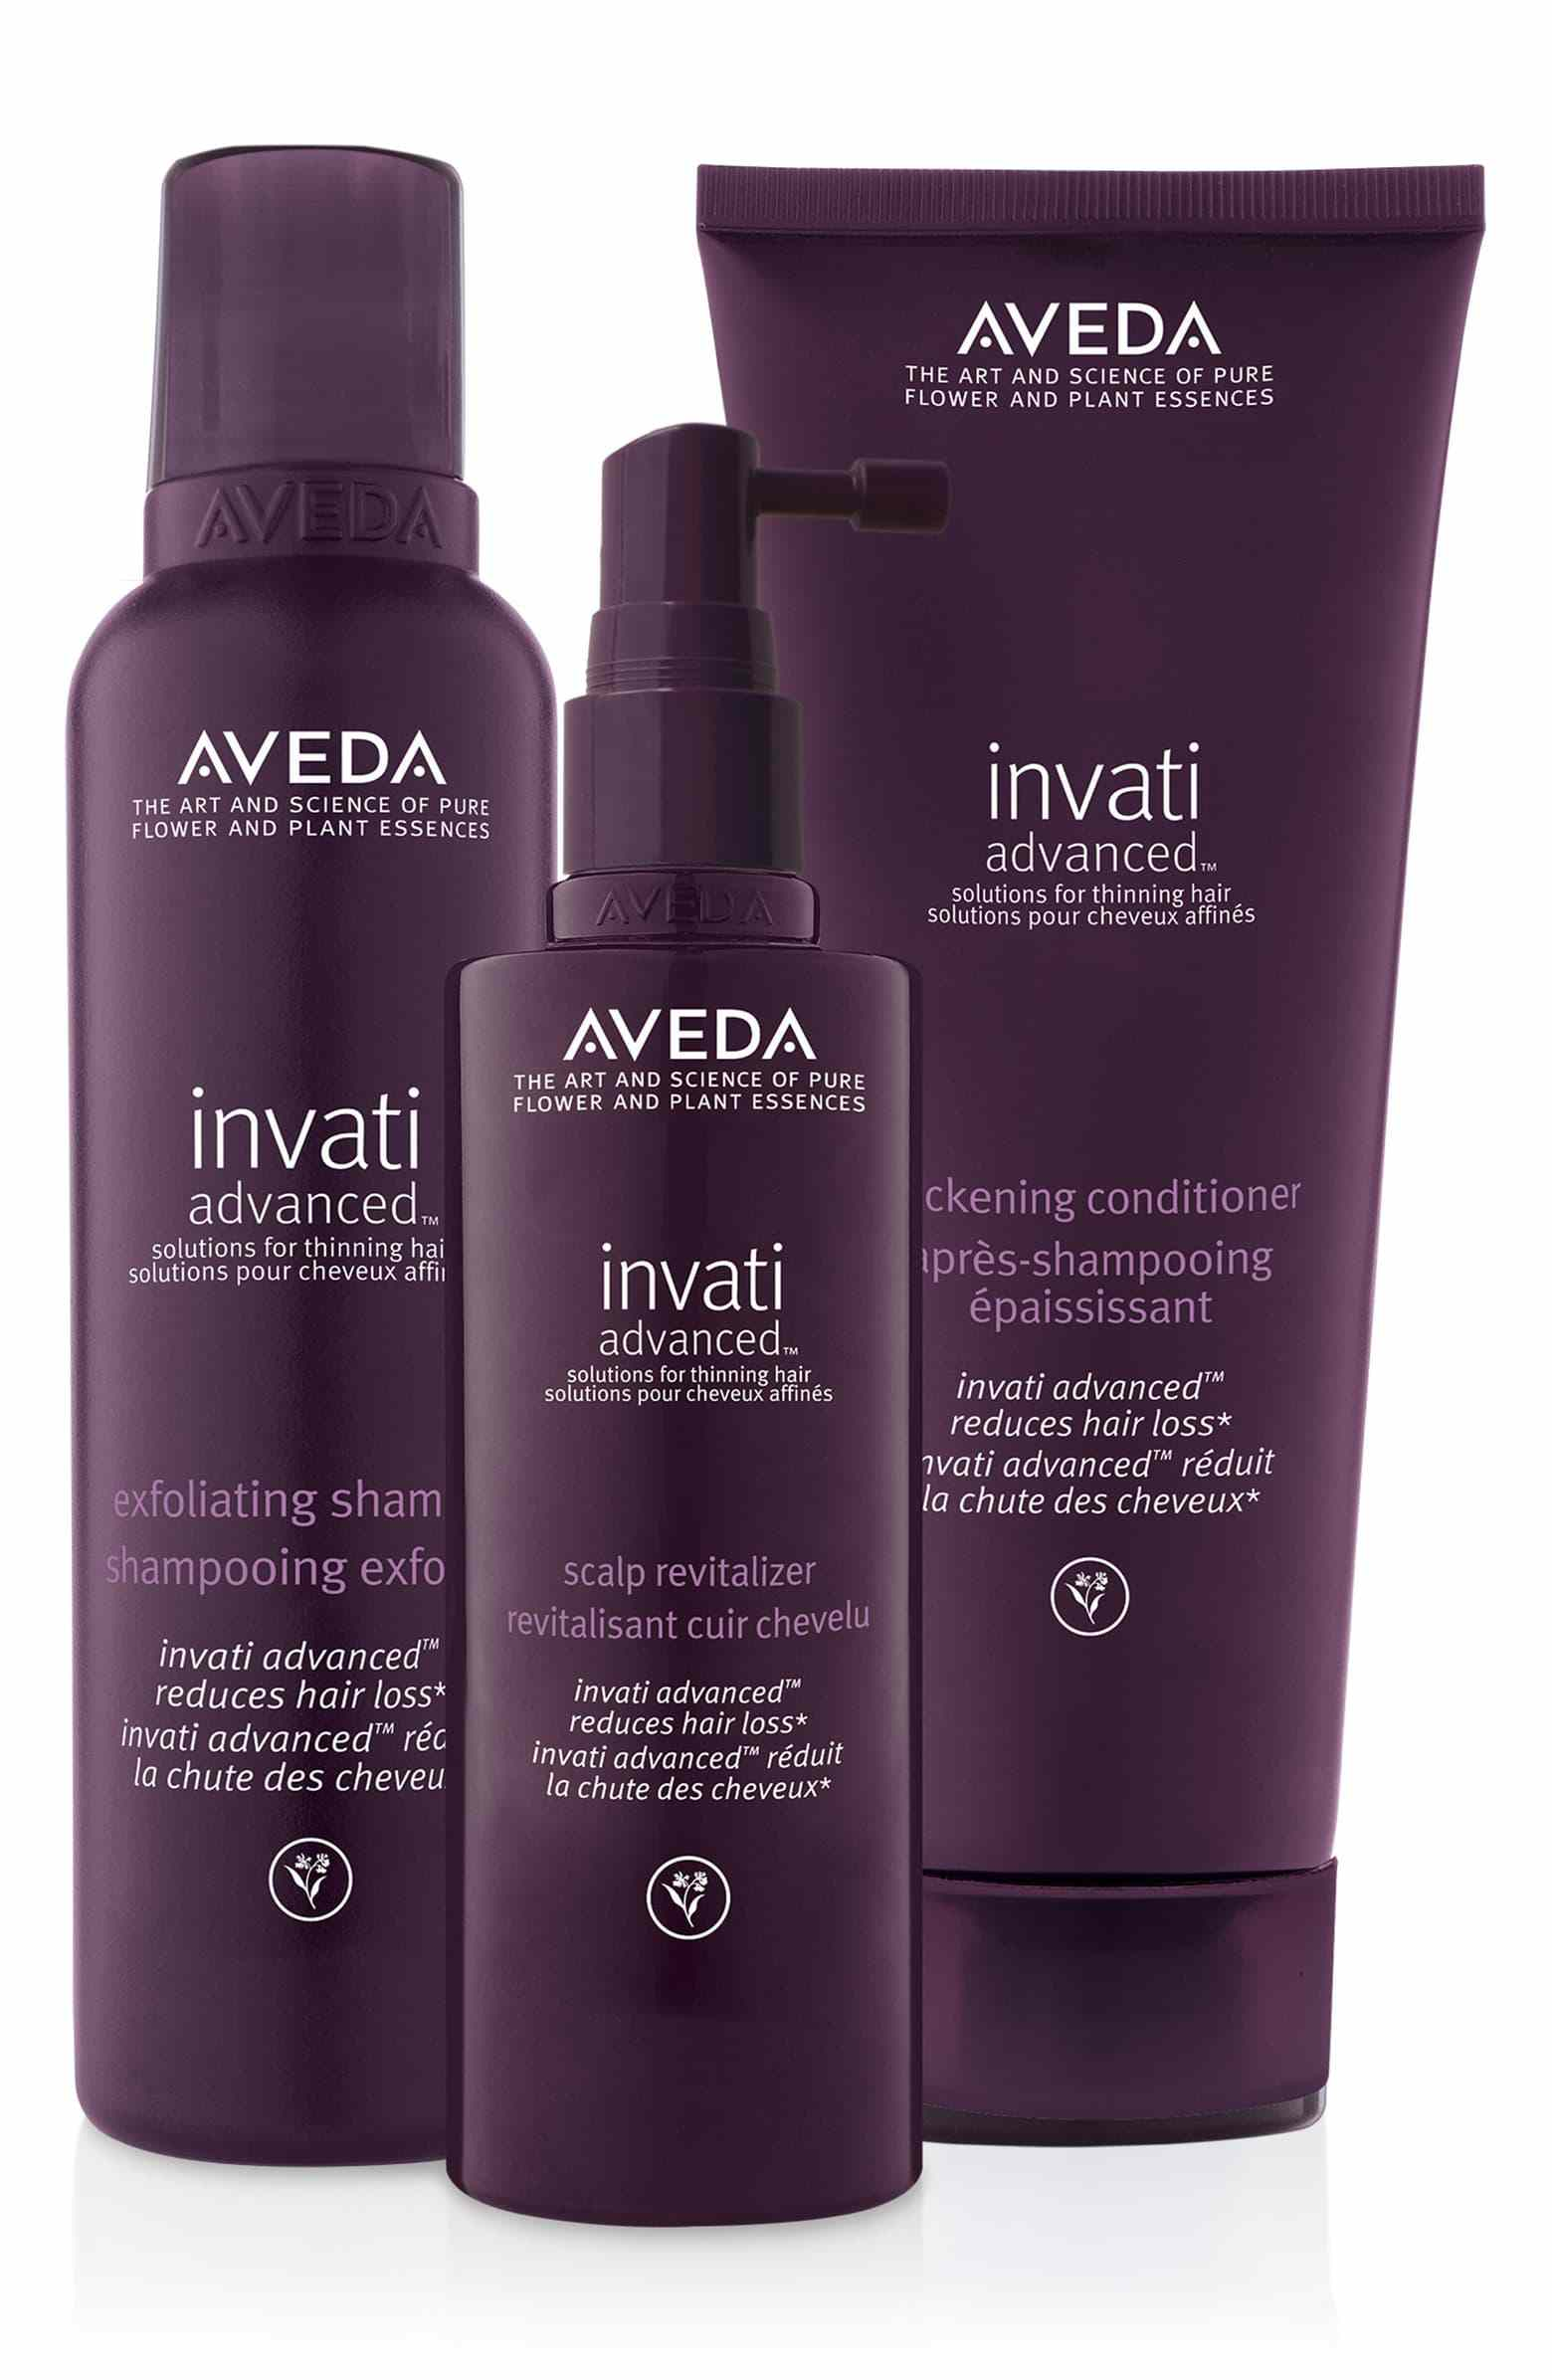 Aveda Invati Advanced Three-Step Kit